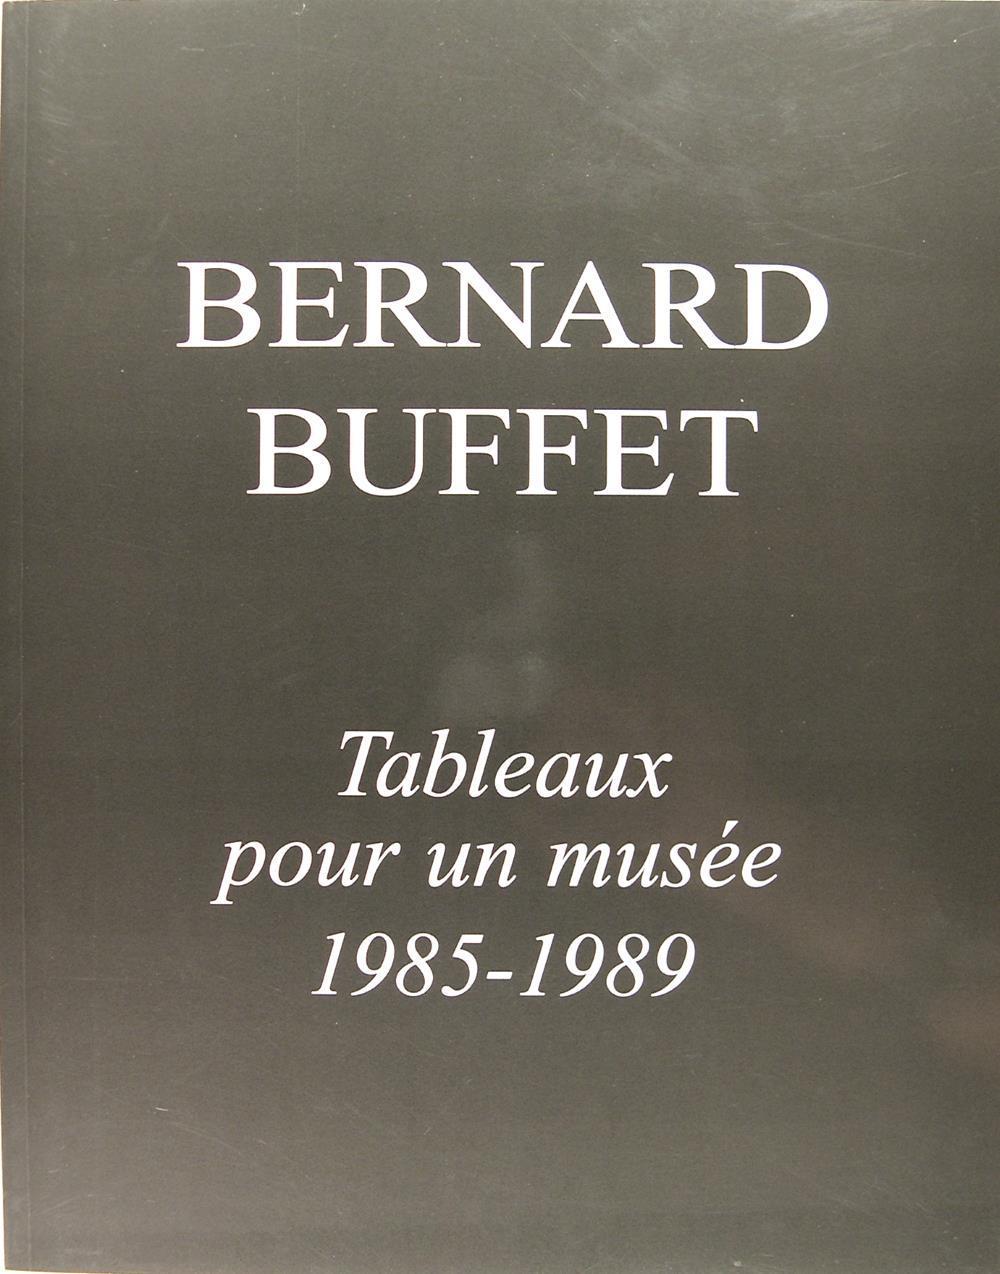 Bernard Buffet : Tableau pour un musée 1985-1989. - Galerie Maurice Garnier (Jean Cocteau)